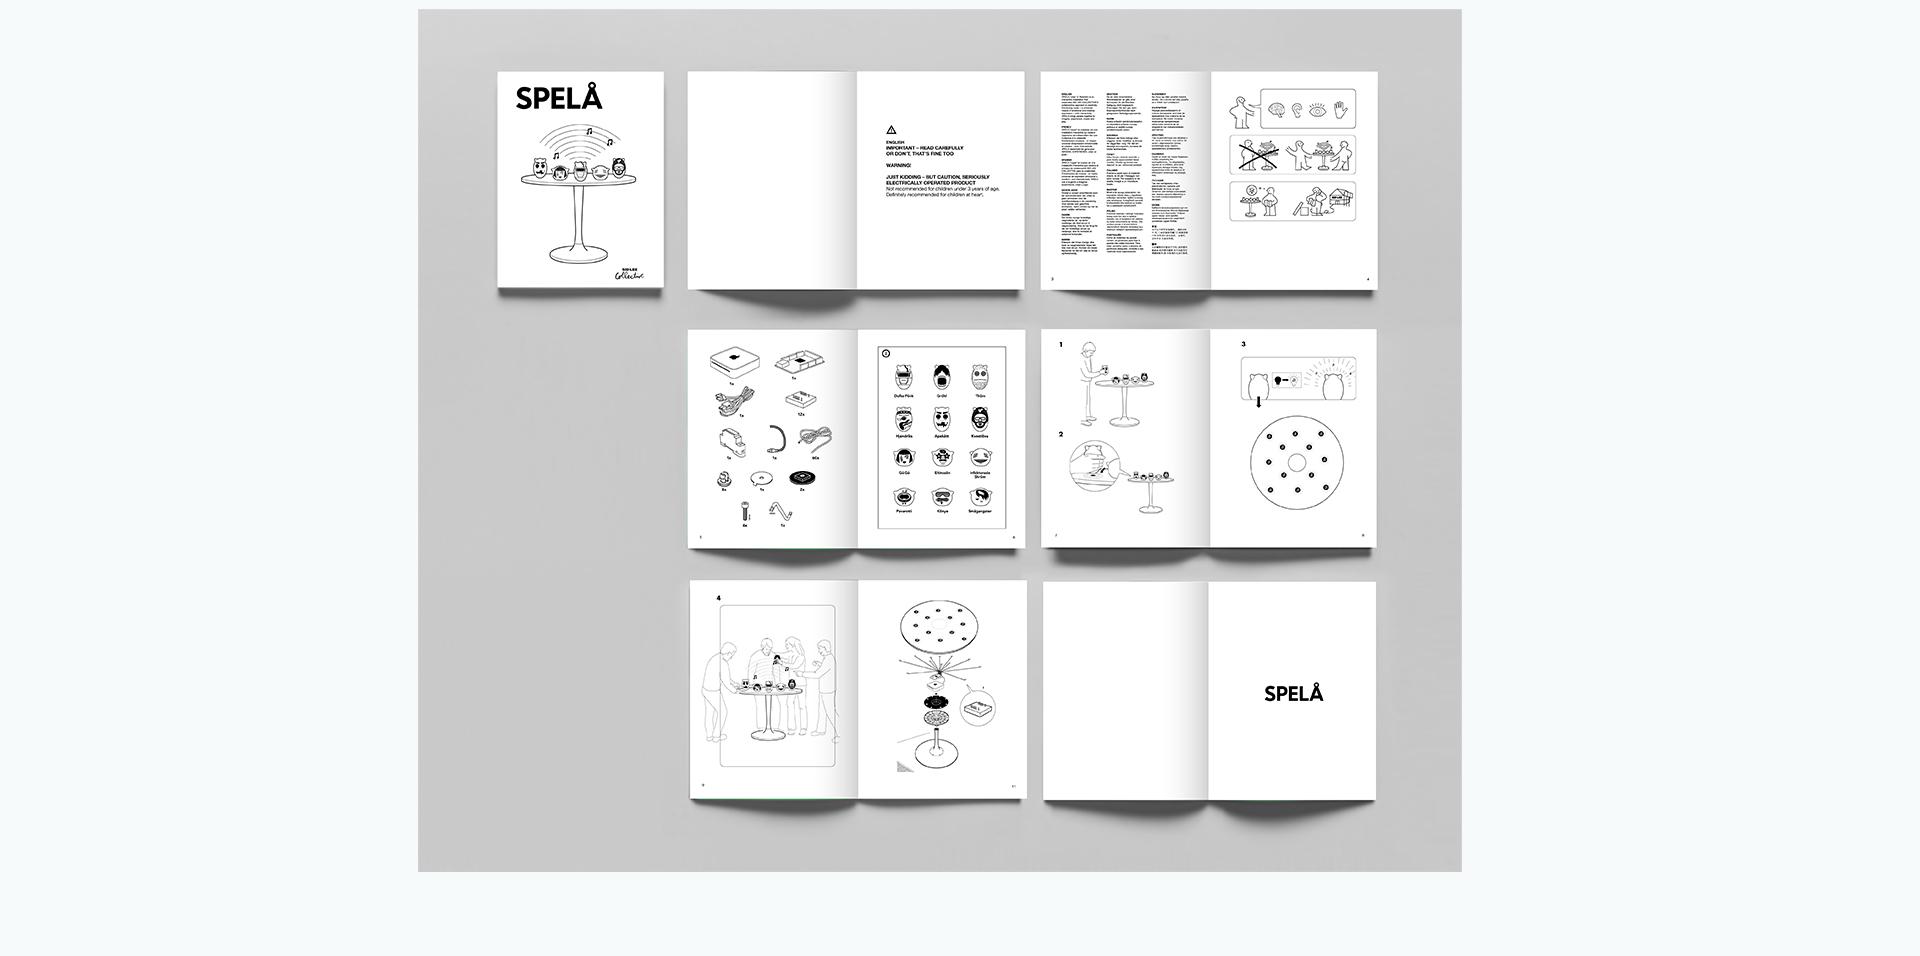 spela-web-manual_09.jpg